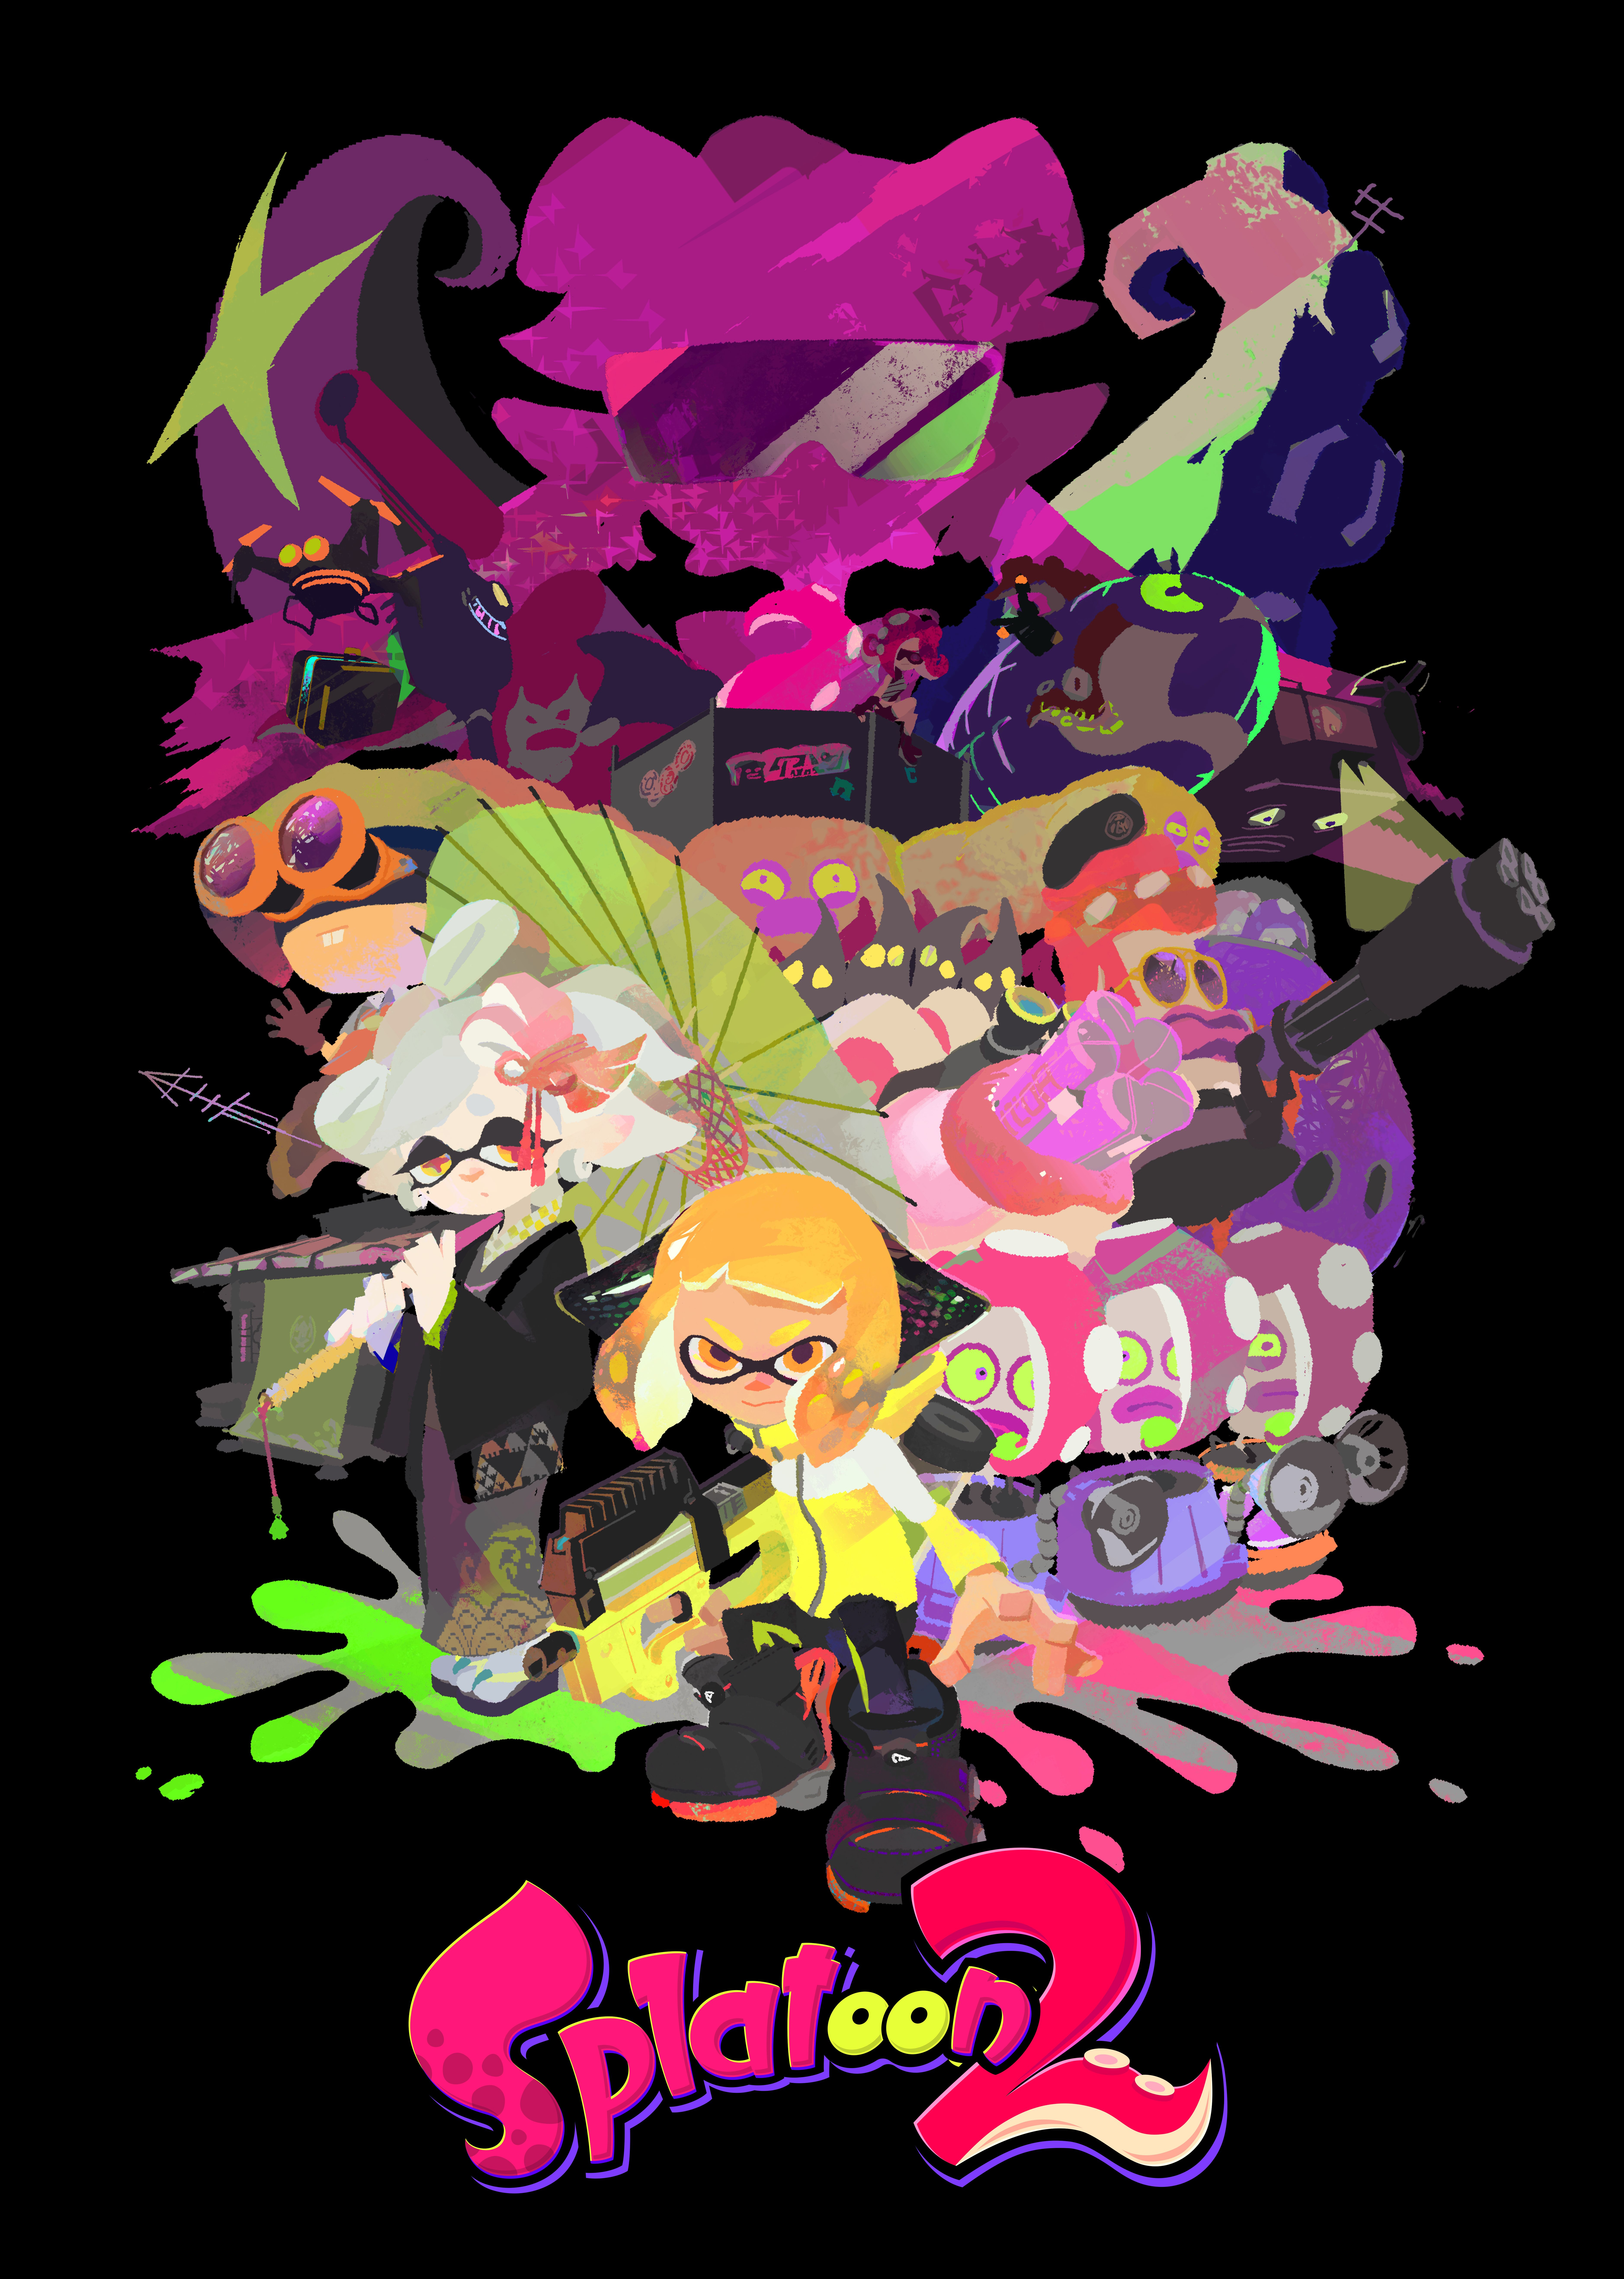 e926 absurd_res group hi_res inkling marie_(splatoon) nintendo octarian octoling official_art splatoon splatoon_2 video_games